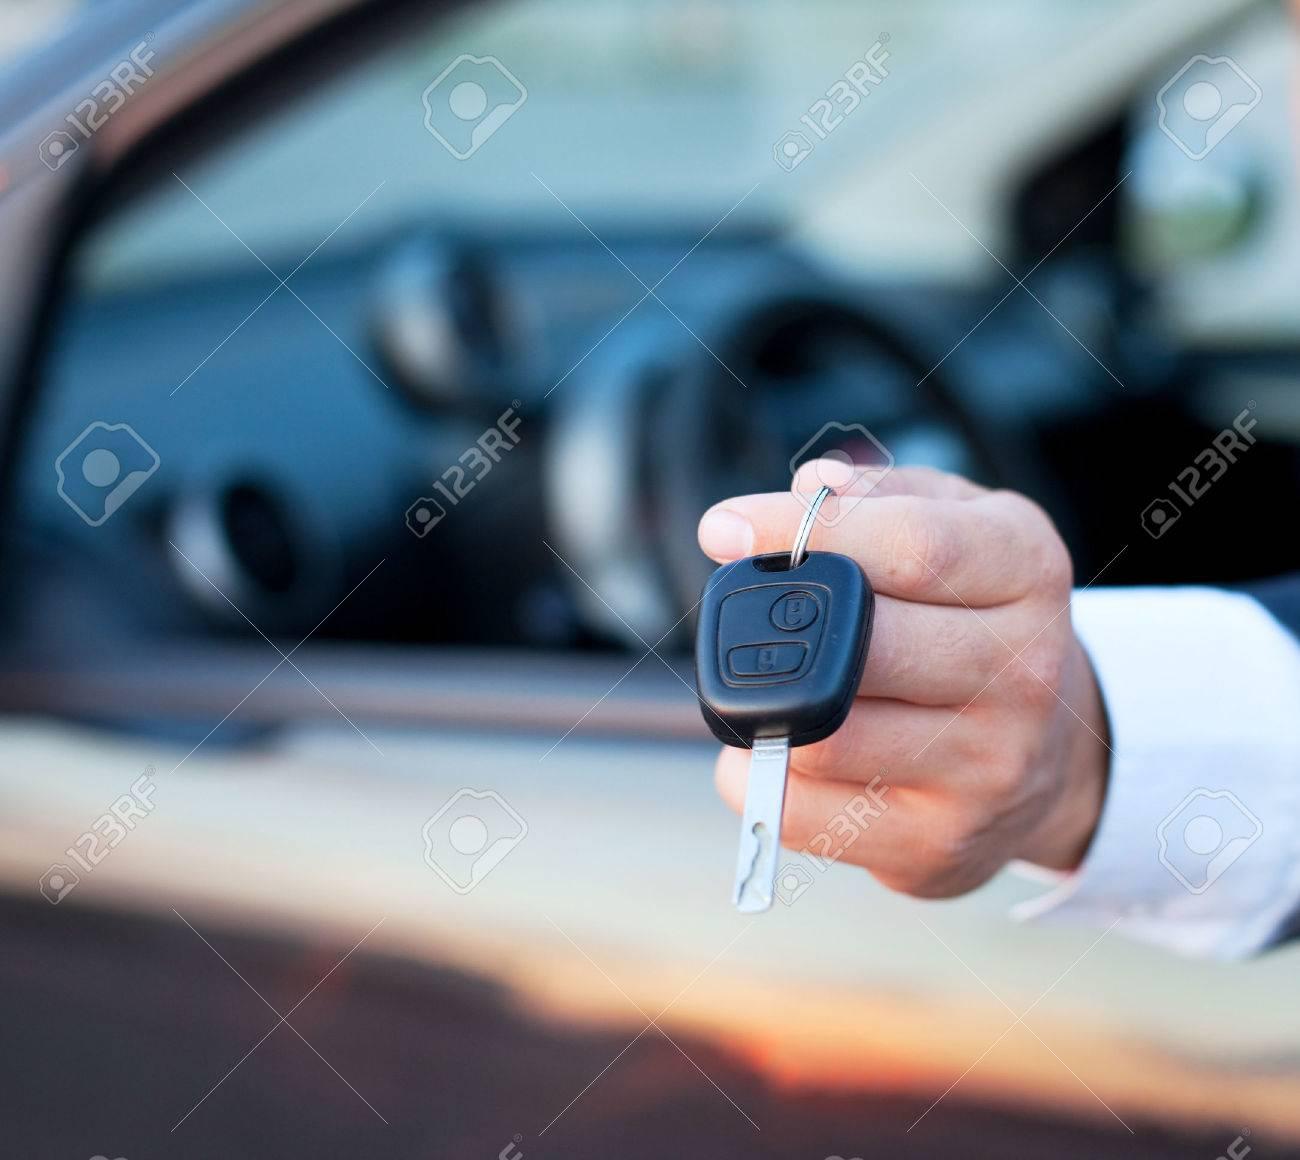 car keys in the hand, rent or buy car - 53076691